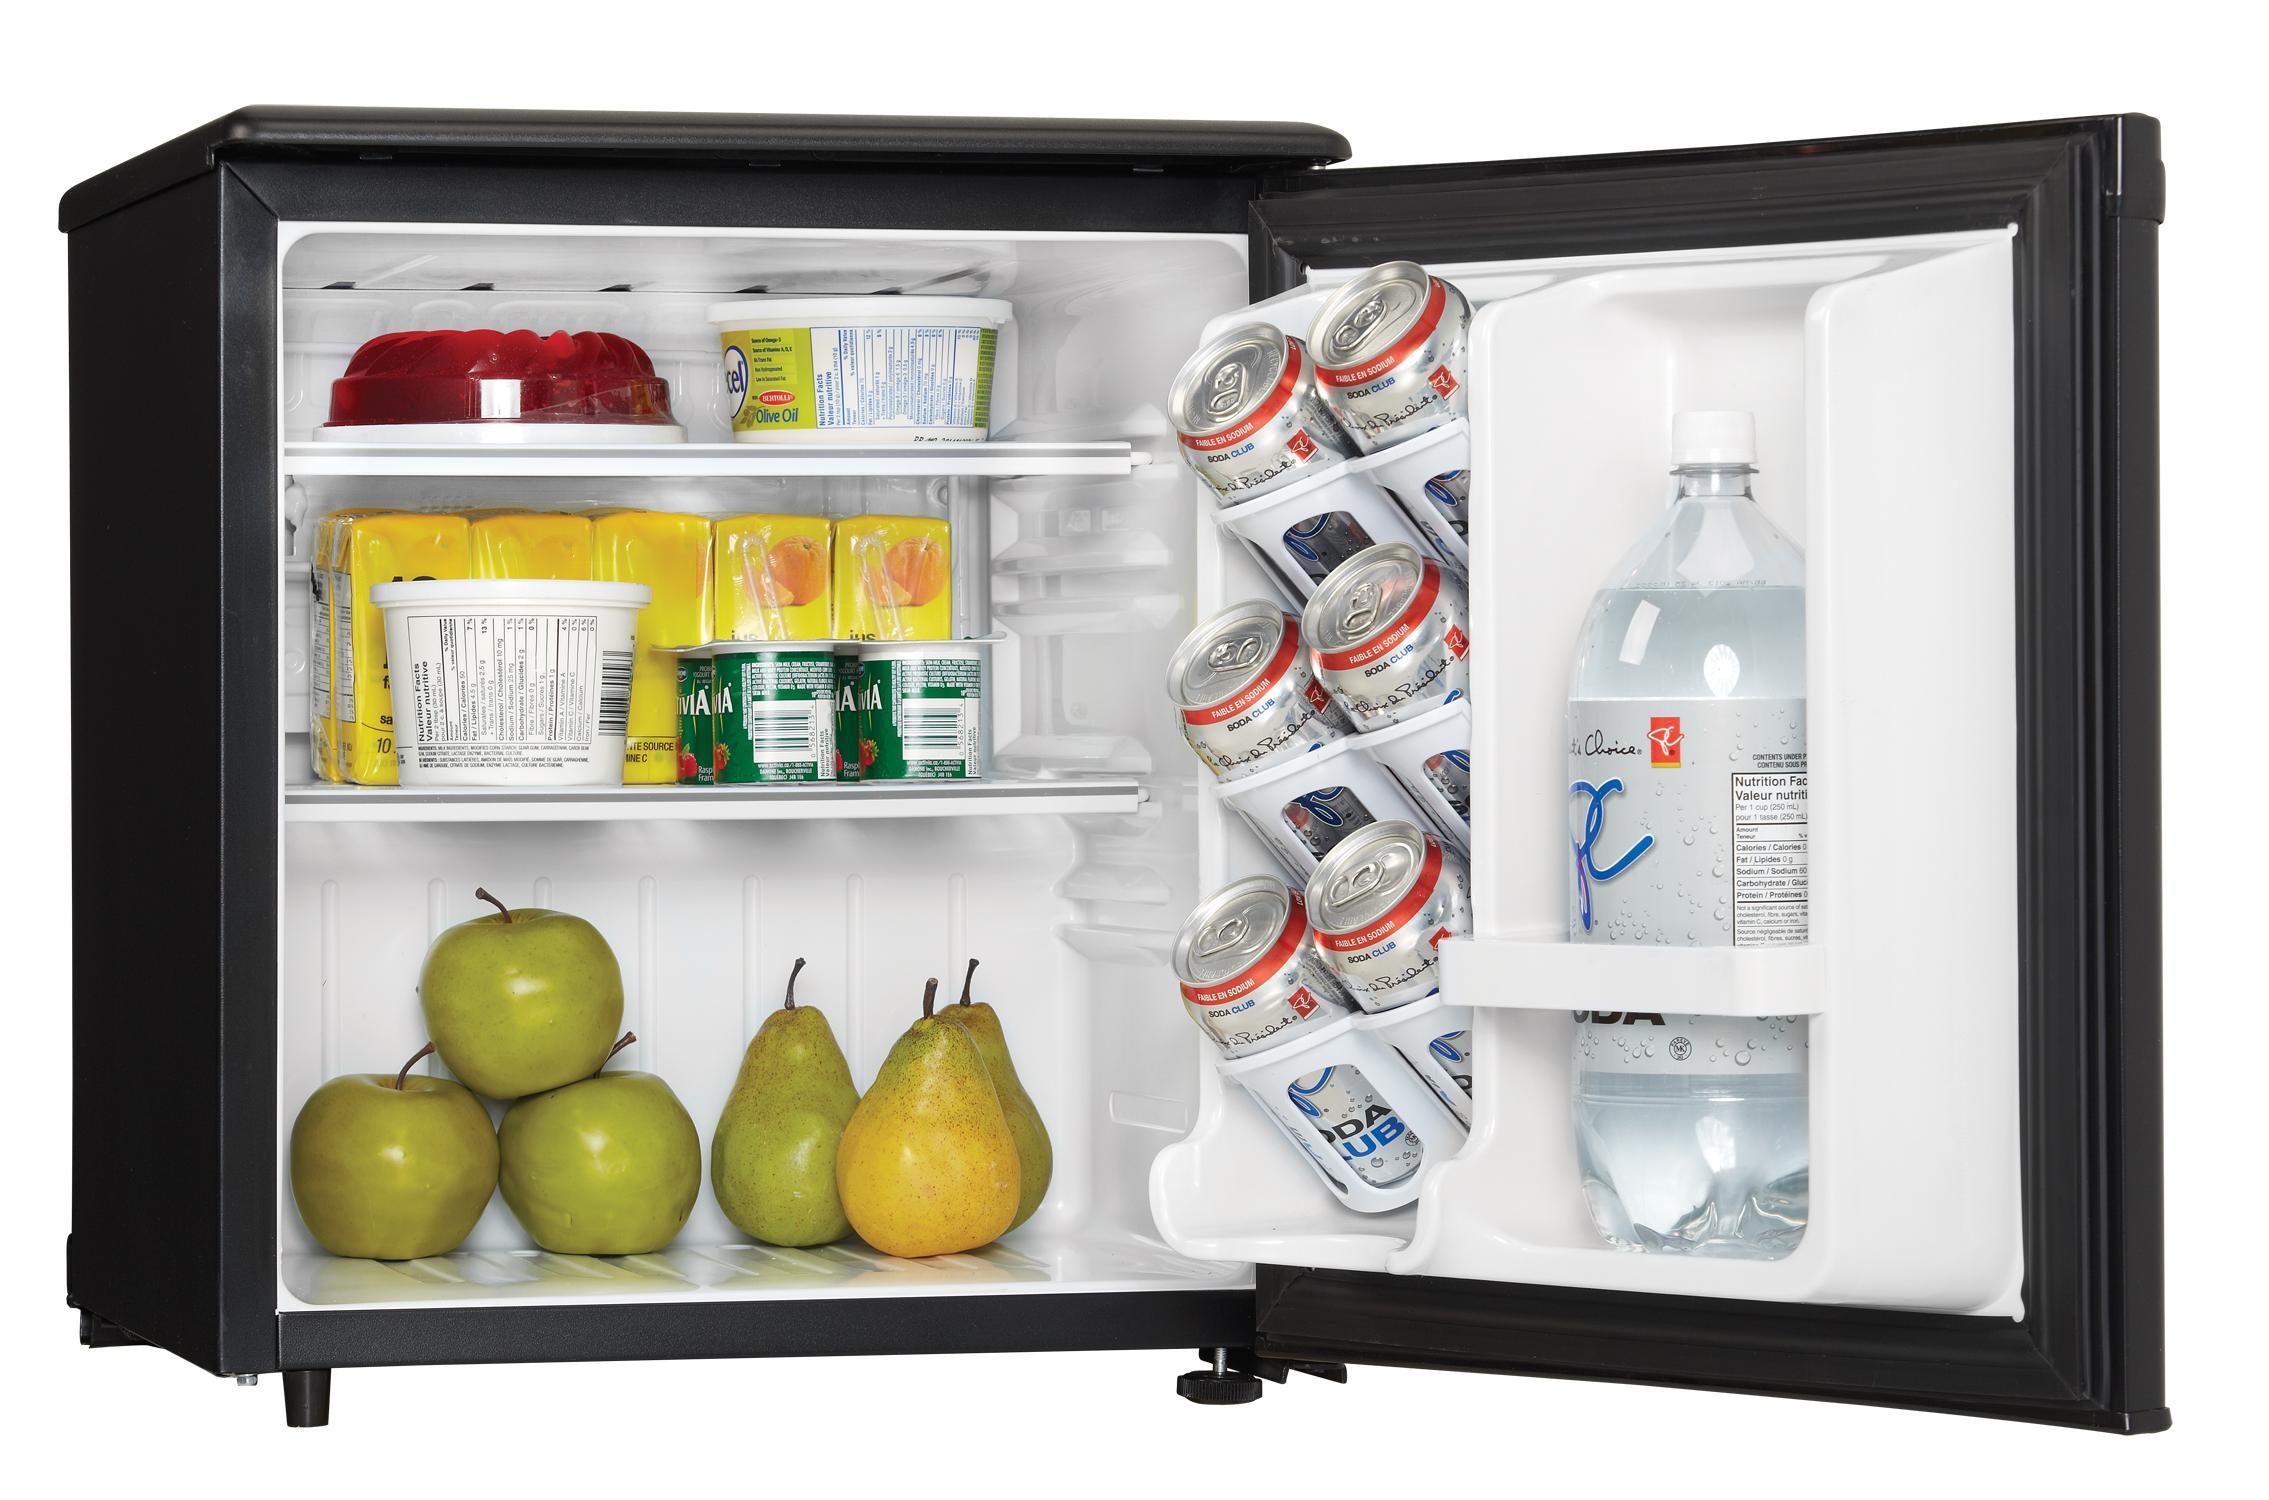 Compact Fridge For Dorm: Amazon.com: Danby DAR017A2BDD Compact All Refrigerator, 1